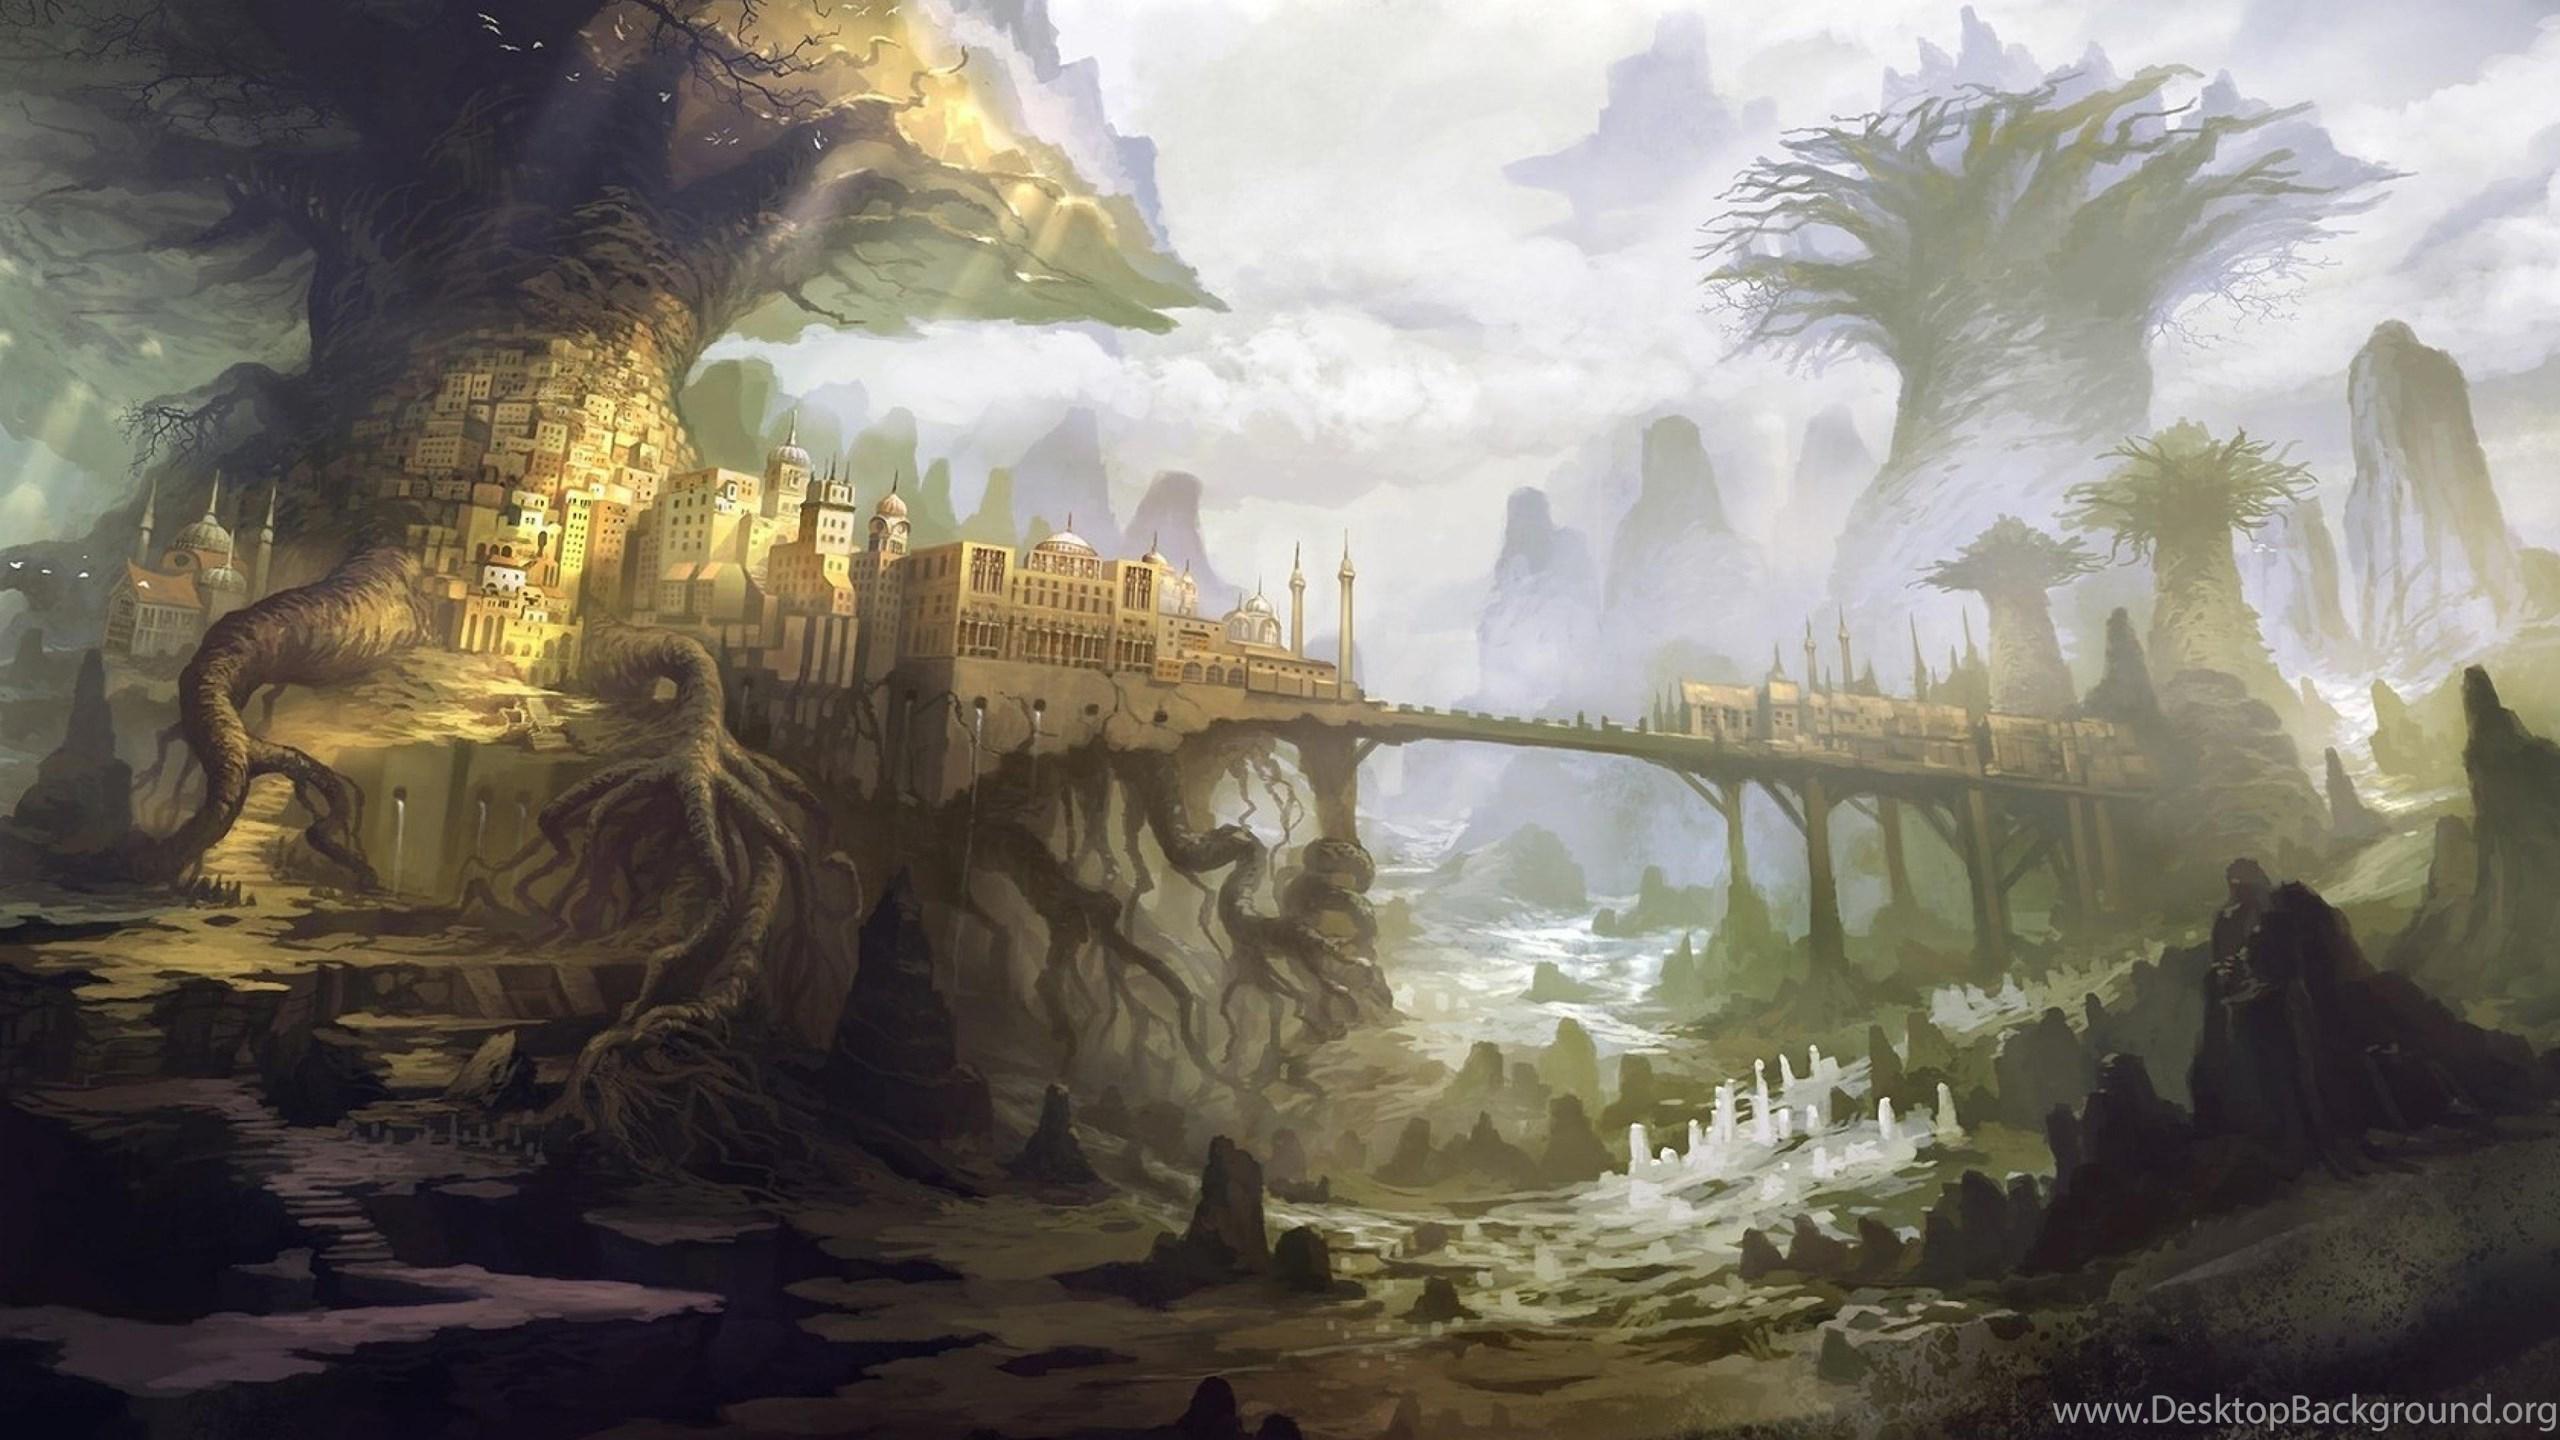 Fantasy World Ipad Wallpaper: Fantasy World Wallpapers Free Kemecer.com Desktop Background